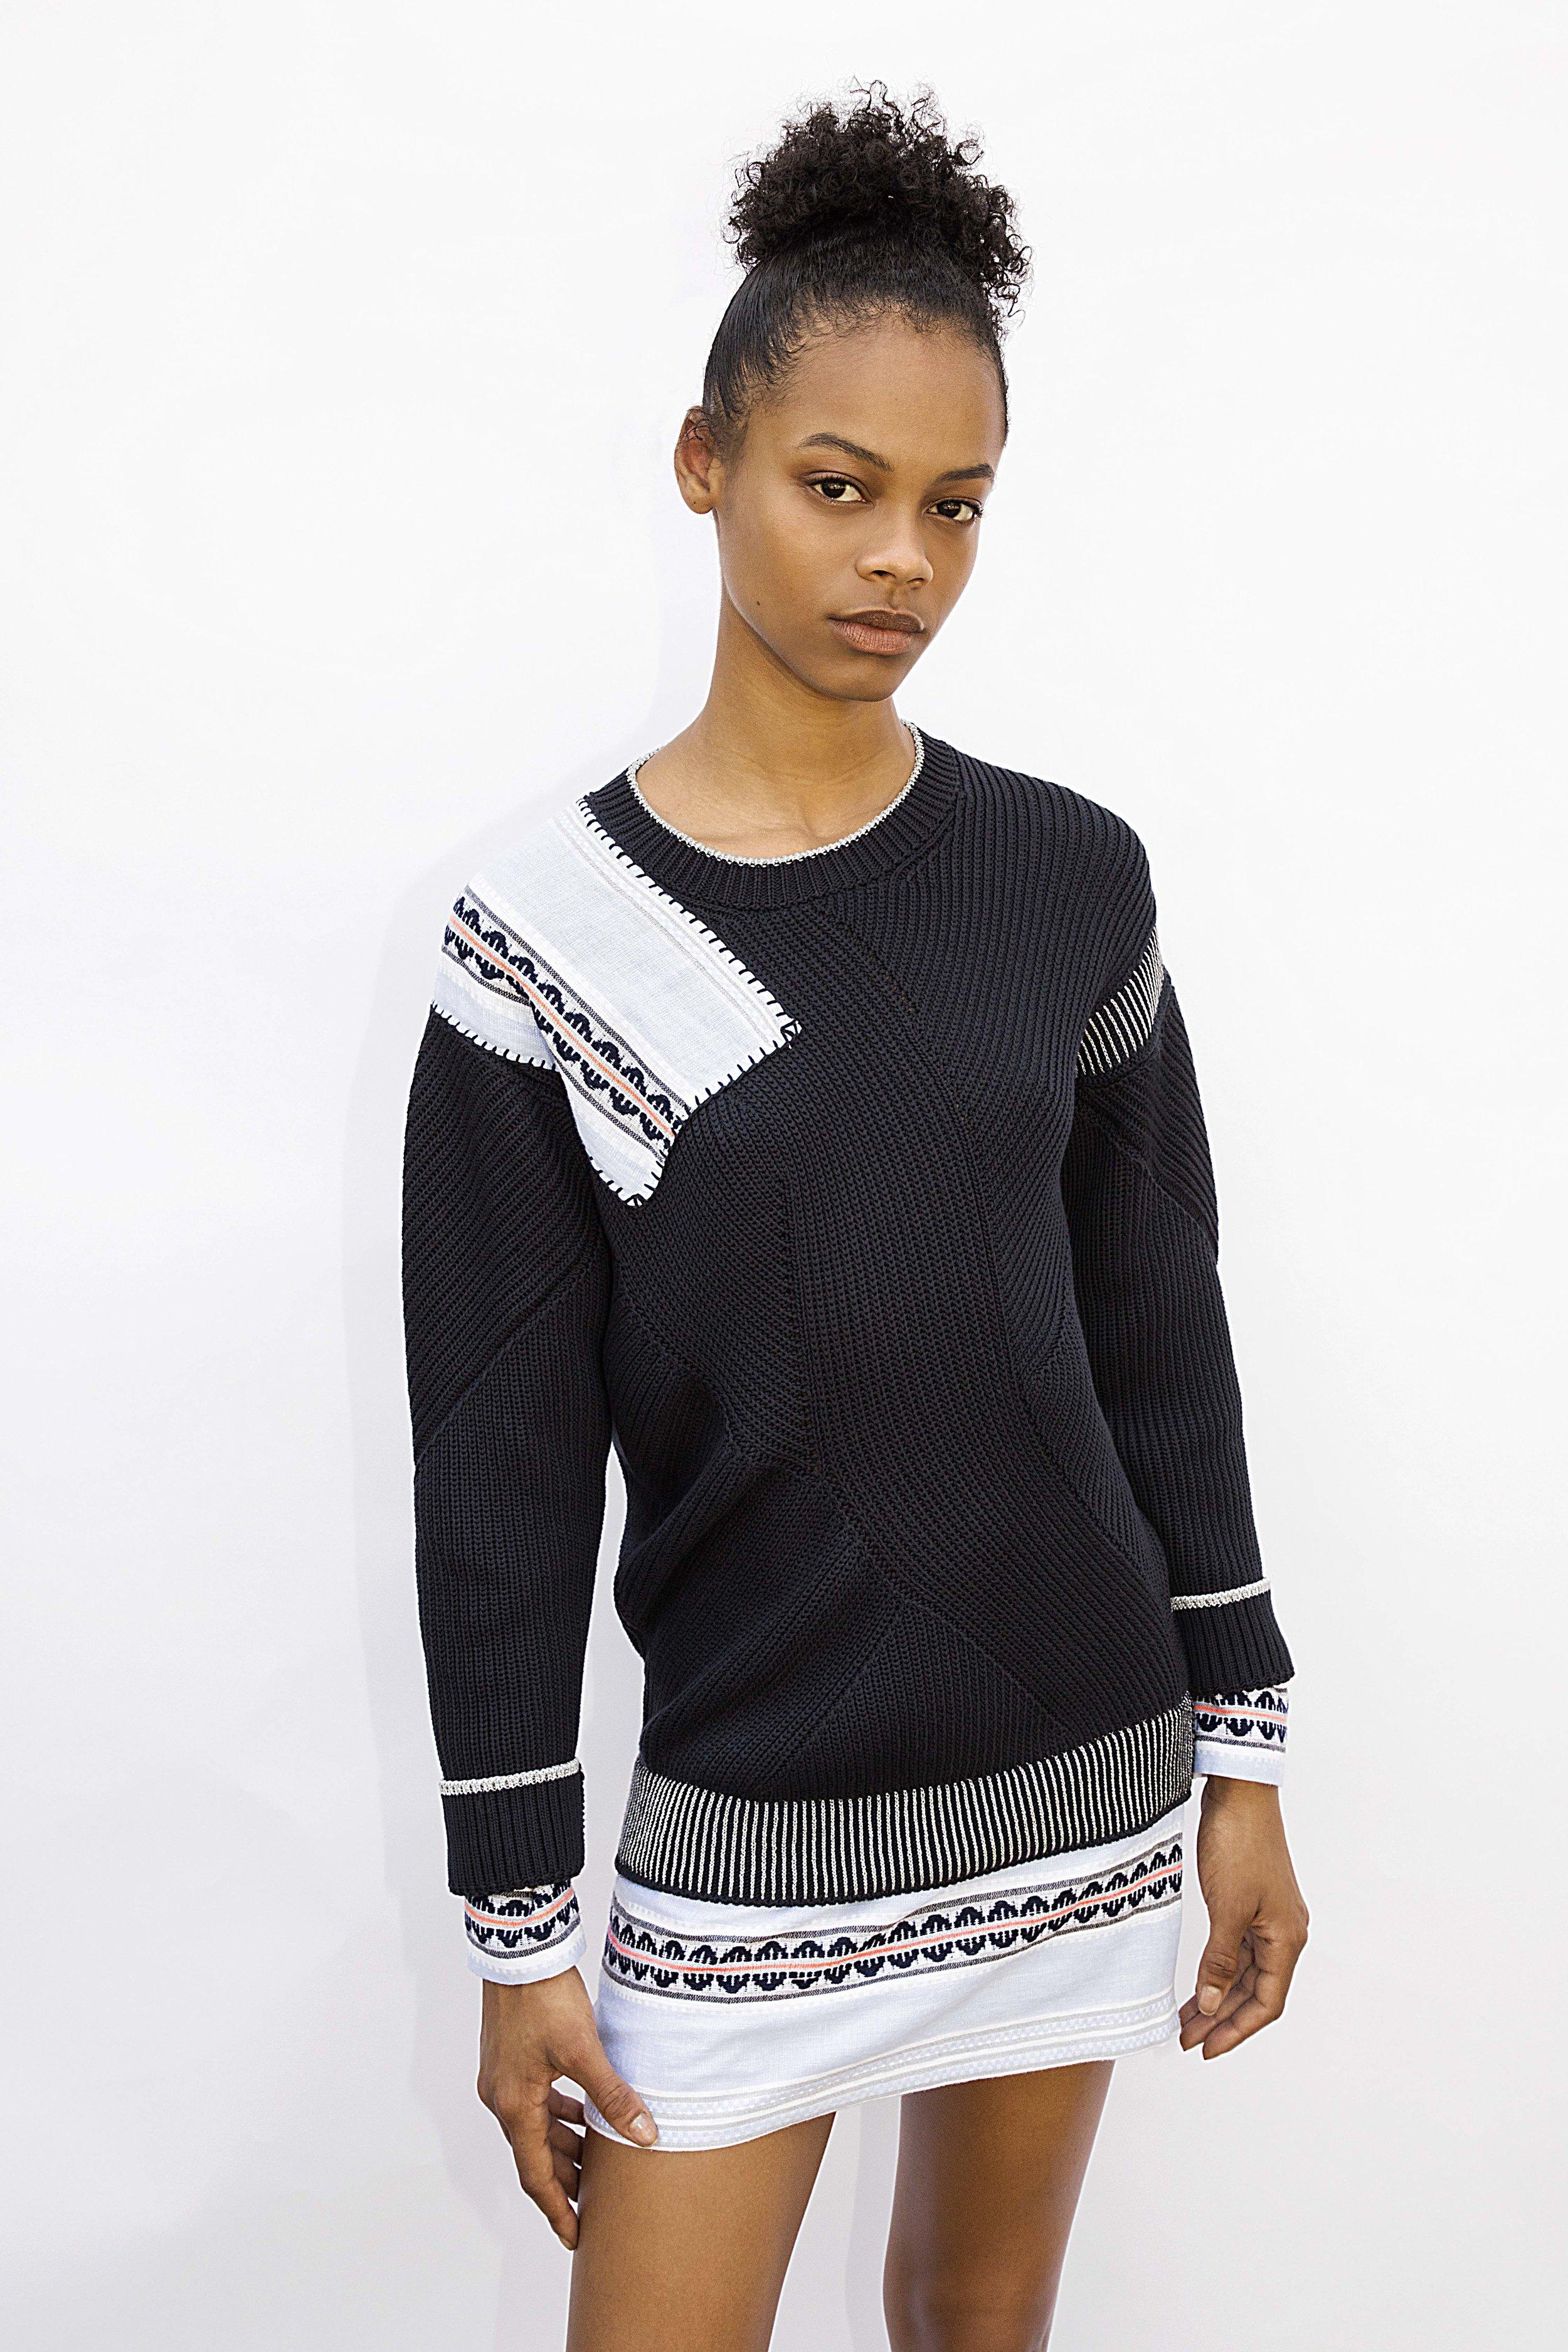 Liya Kebede's design for Generous Sweaters/Sonia Rykiel. All photos courtesy of Sonia Rykiel.